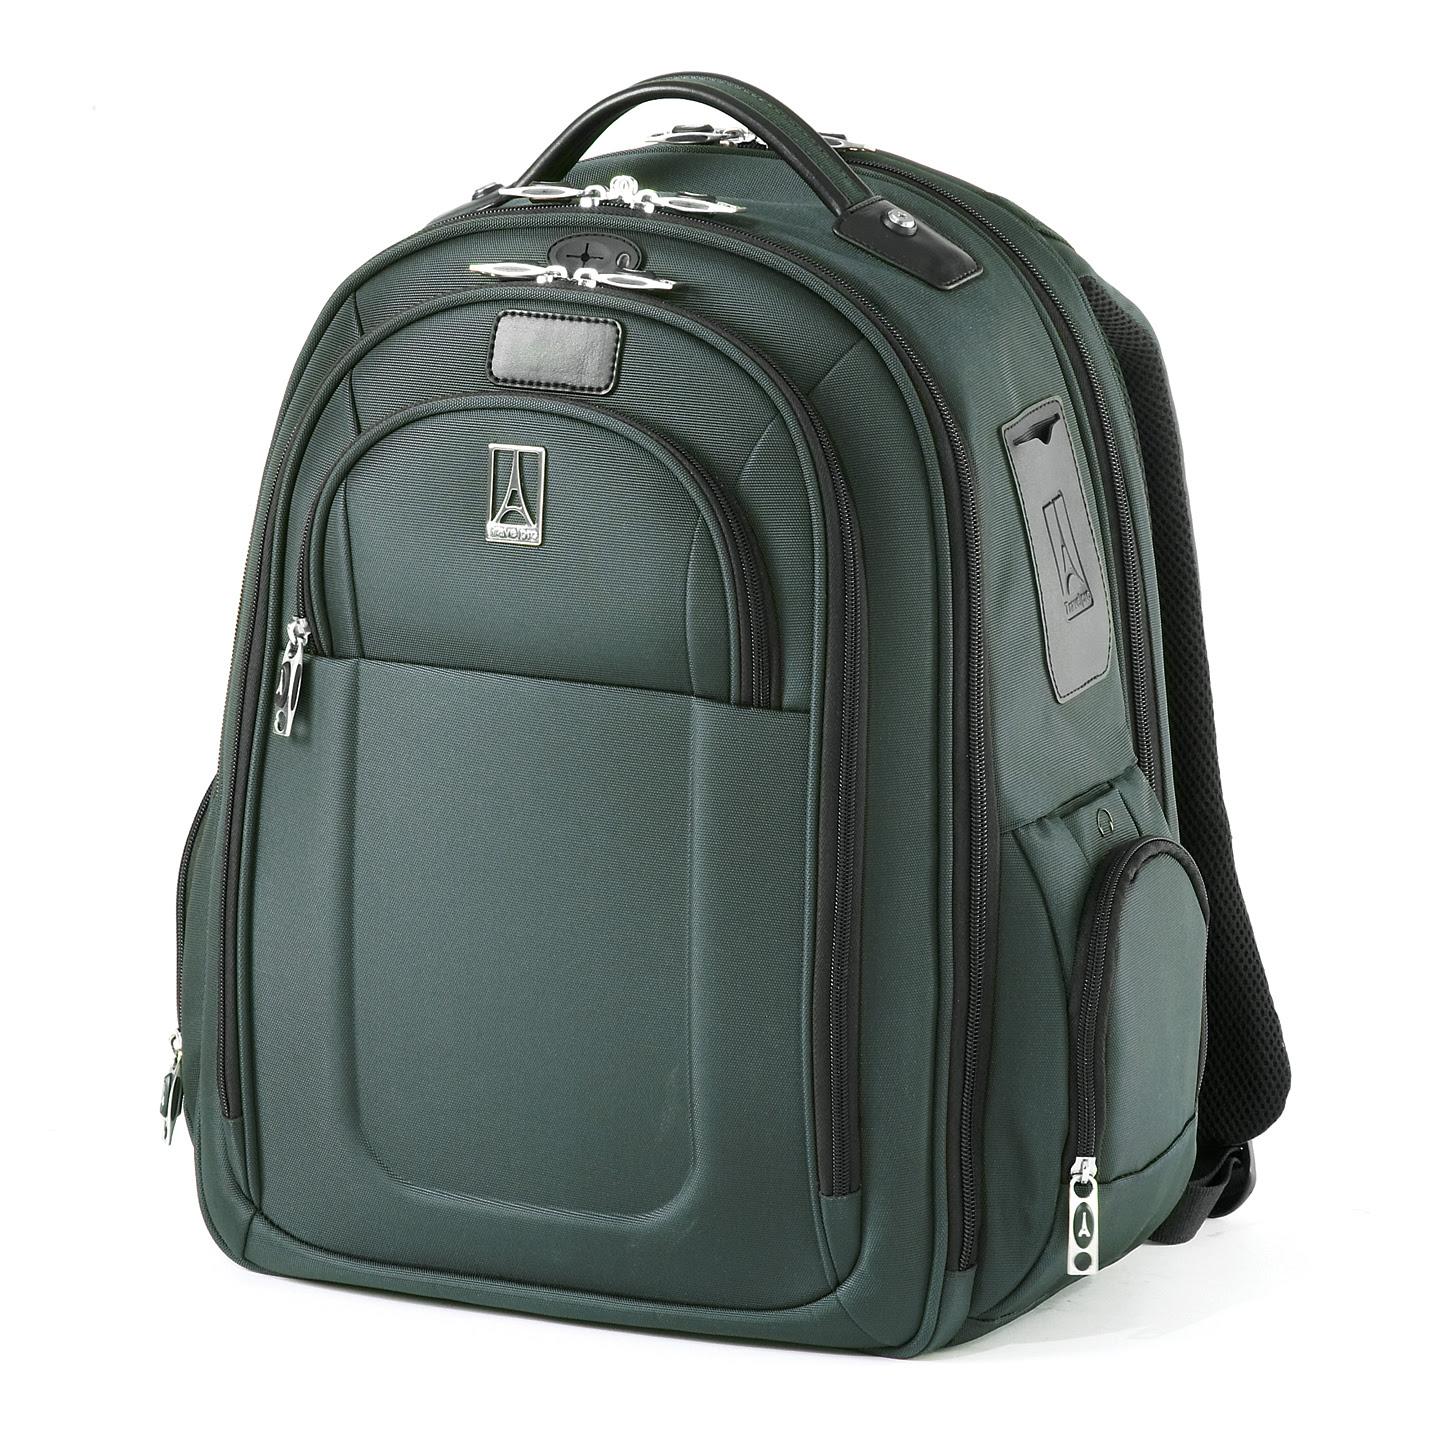 travel backpack  best backpacks for business travel Backpack Tools d031c44bd1bb8